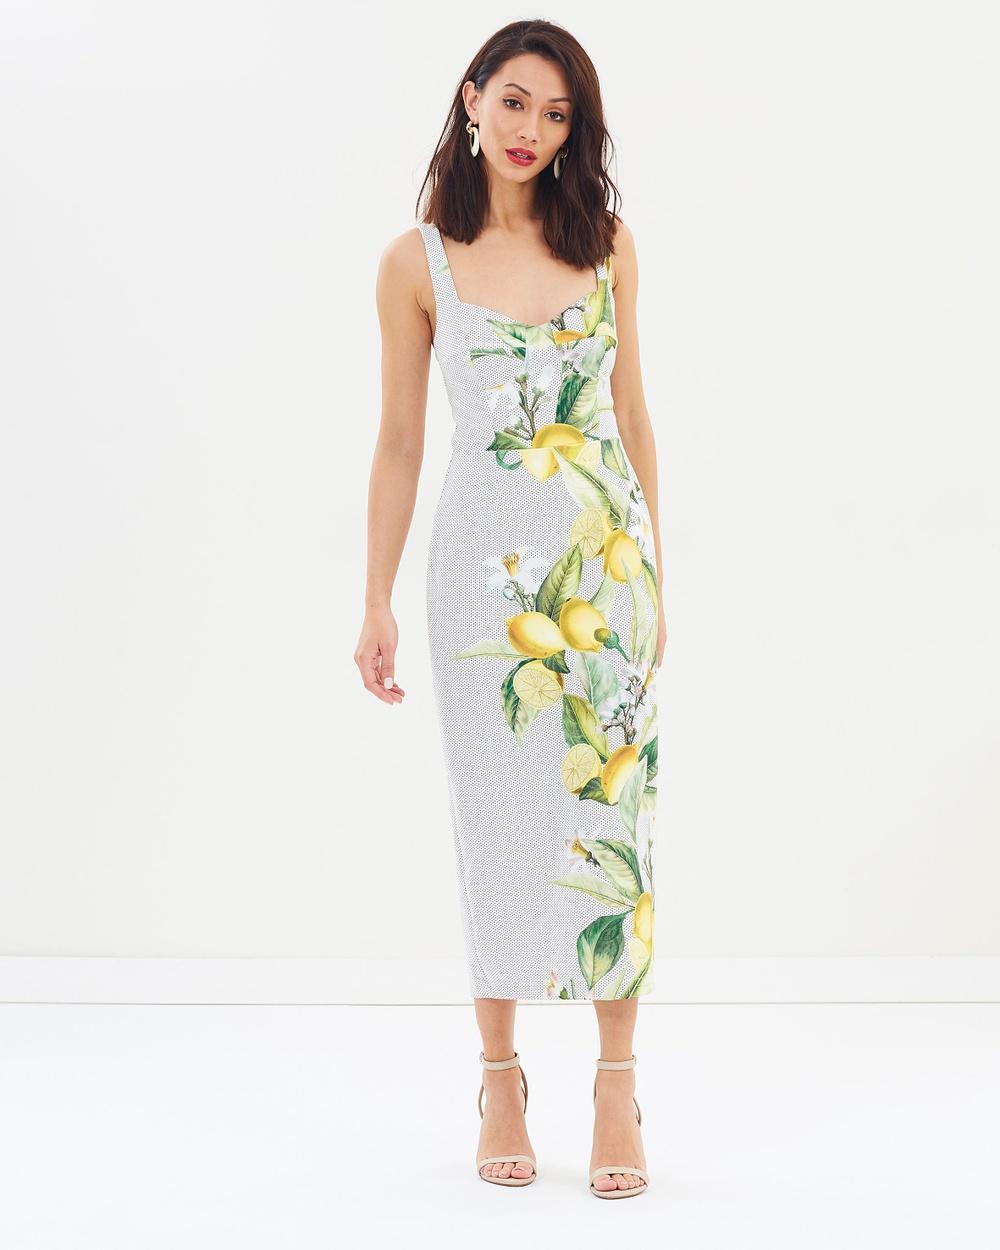 Pasduchas Citrus Brassiere Midi Dress Printed Dresses Ivory Citrus Brassiere Midi Dress